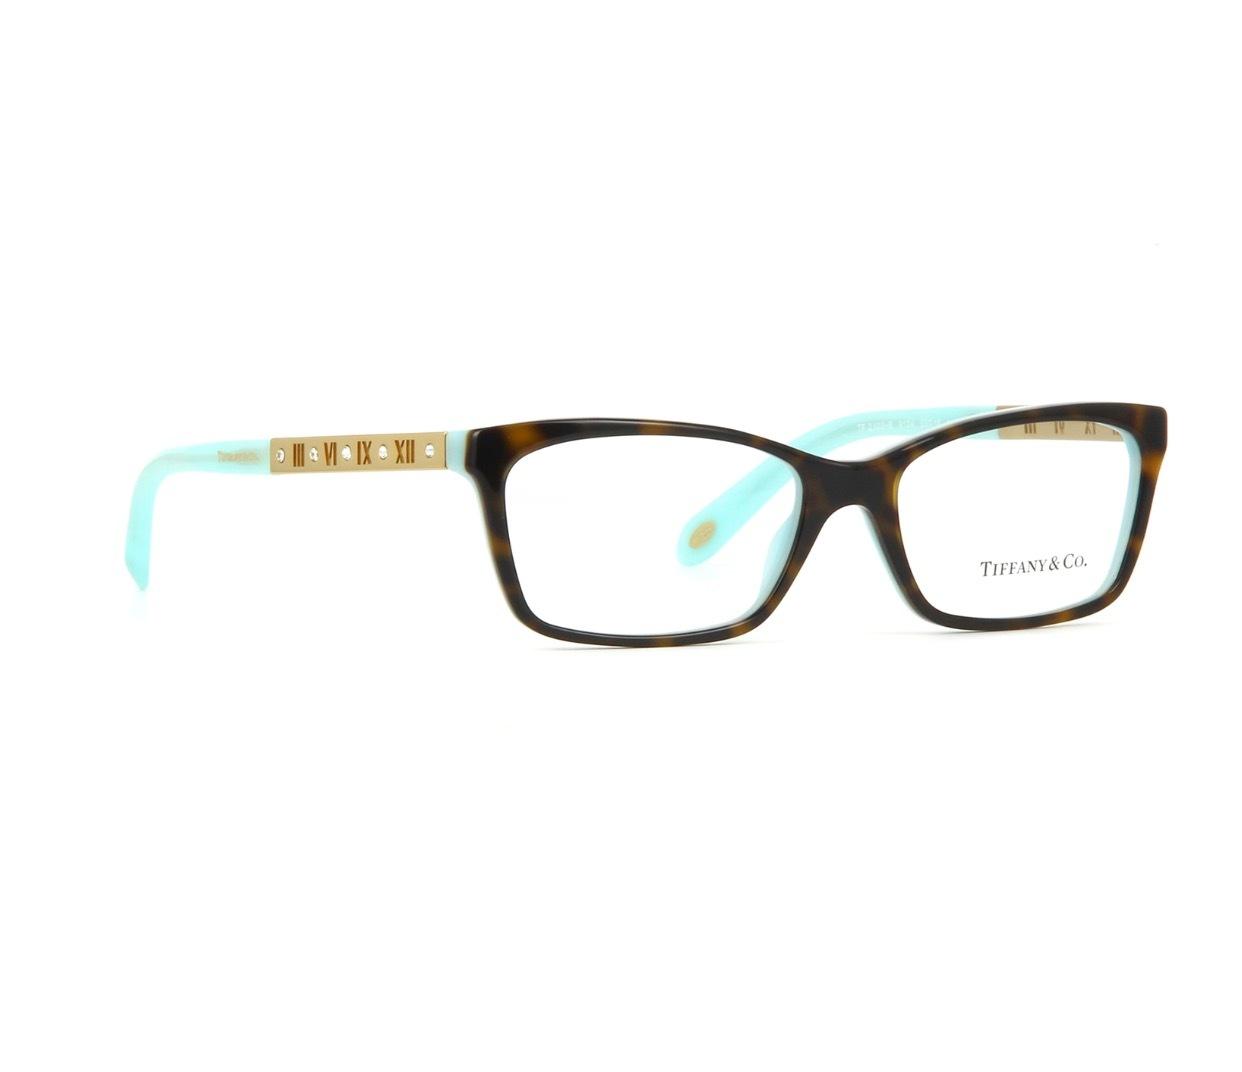 Tiffany Glasses Frames Blue : New Authentic Tiffany & Co. TF2103B 8134 Tortoise Blue ...